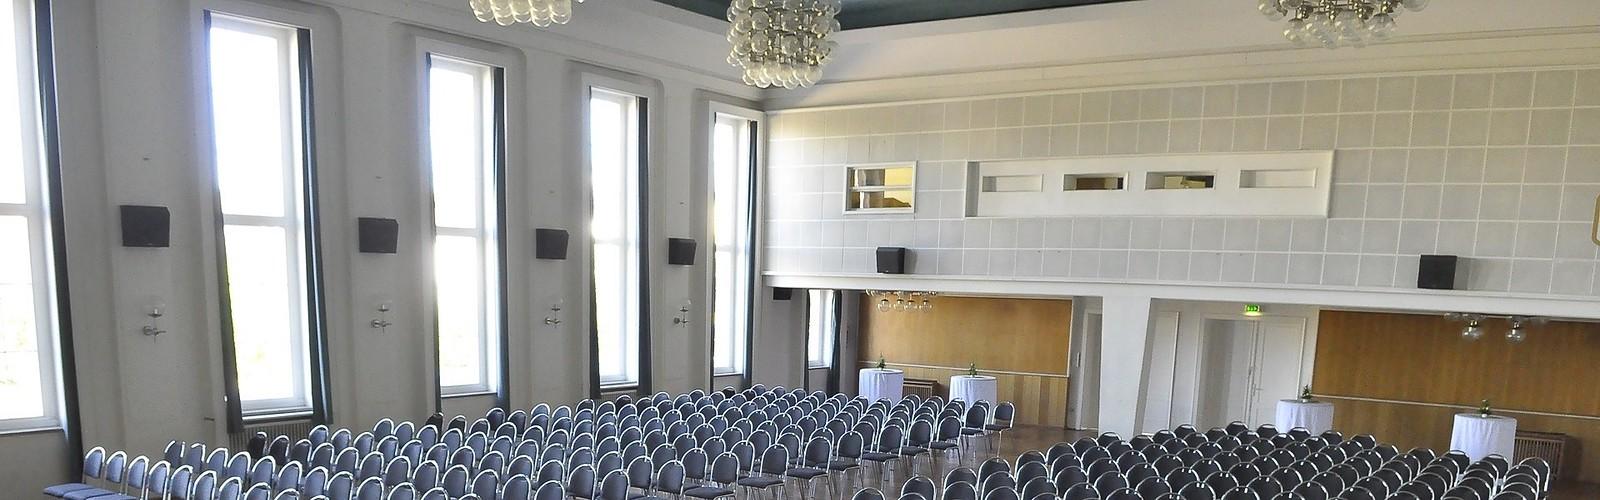 Hall, photo: Kulturhaus Pritzwalk